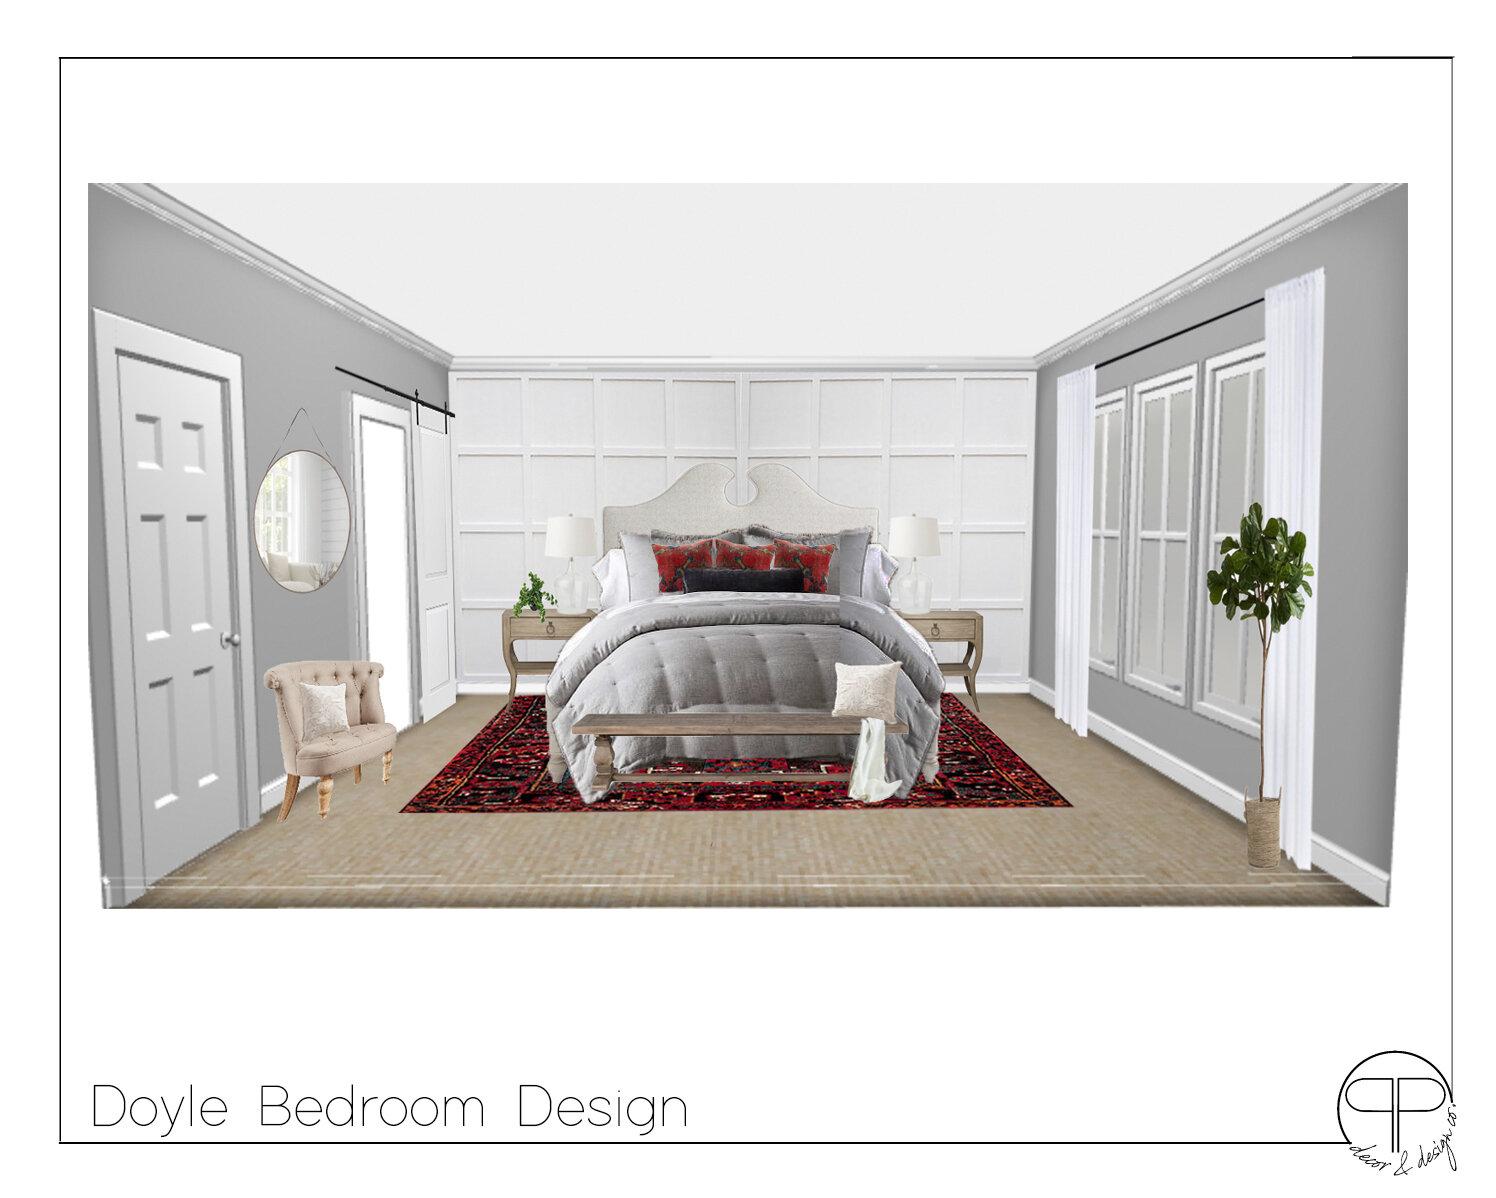 Doyle_Bedroom_Design.jpg